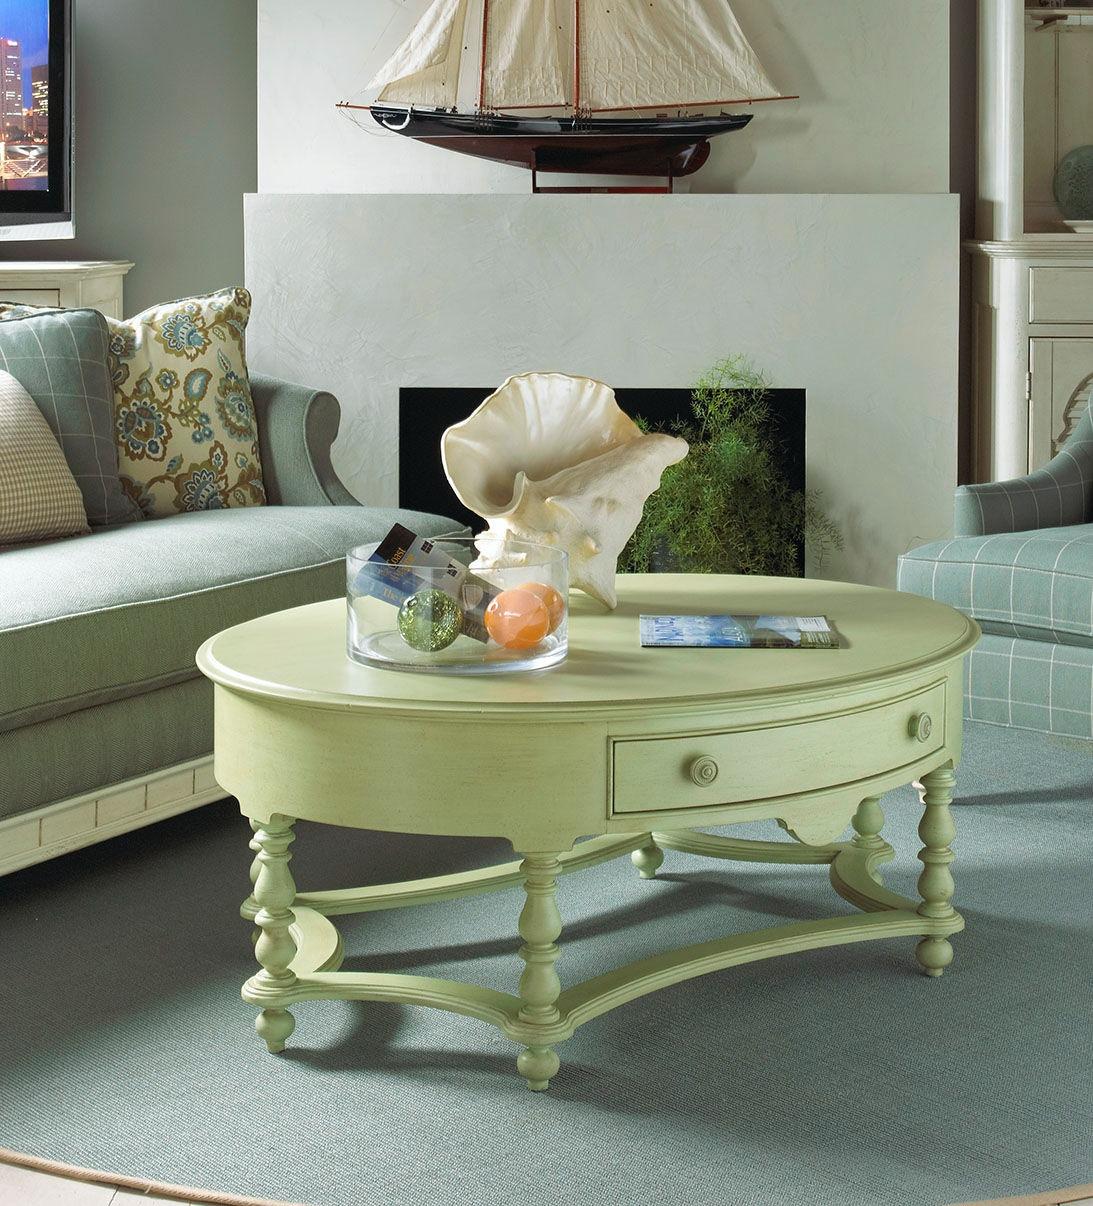 Fine Furniture Design Living Room Oval Cocktail Table 1052 932   Meg Brown  Home Furnishings   Advance, Winston Salem, Greensboro And Lexington, NC